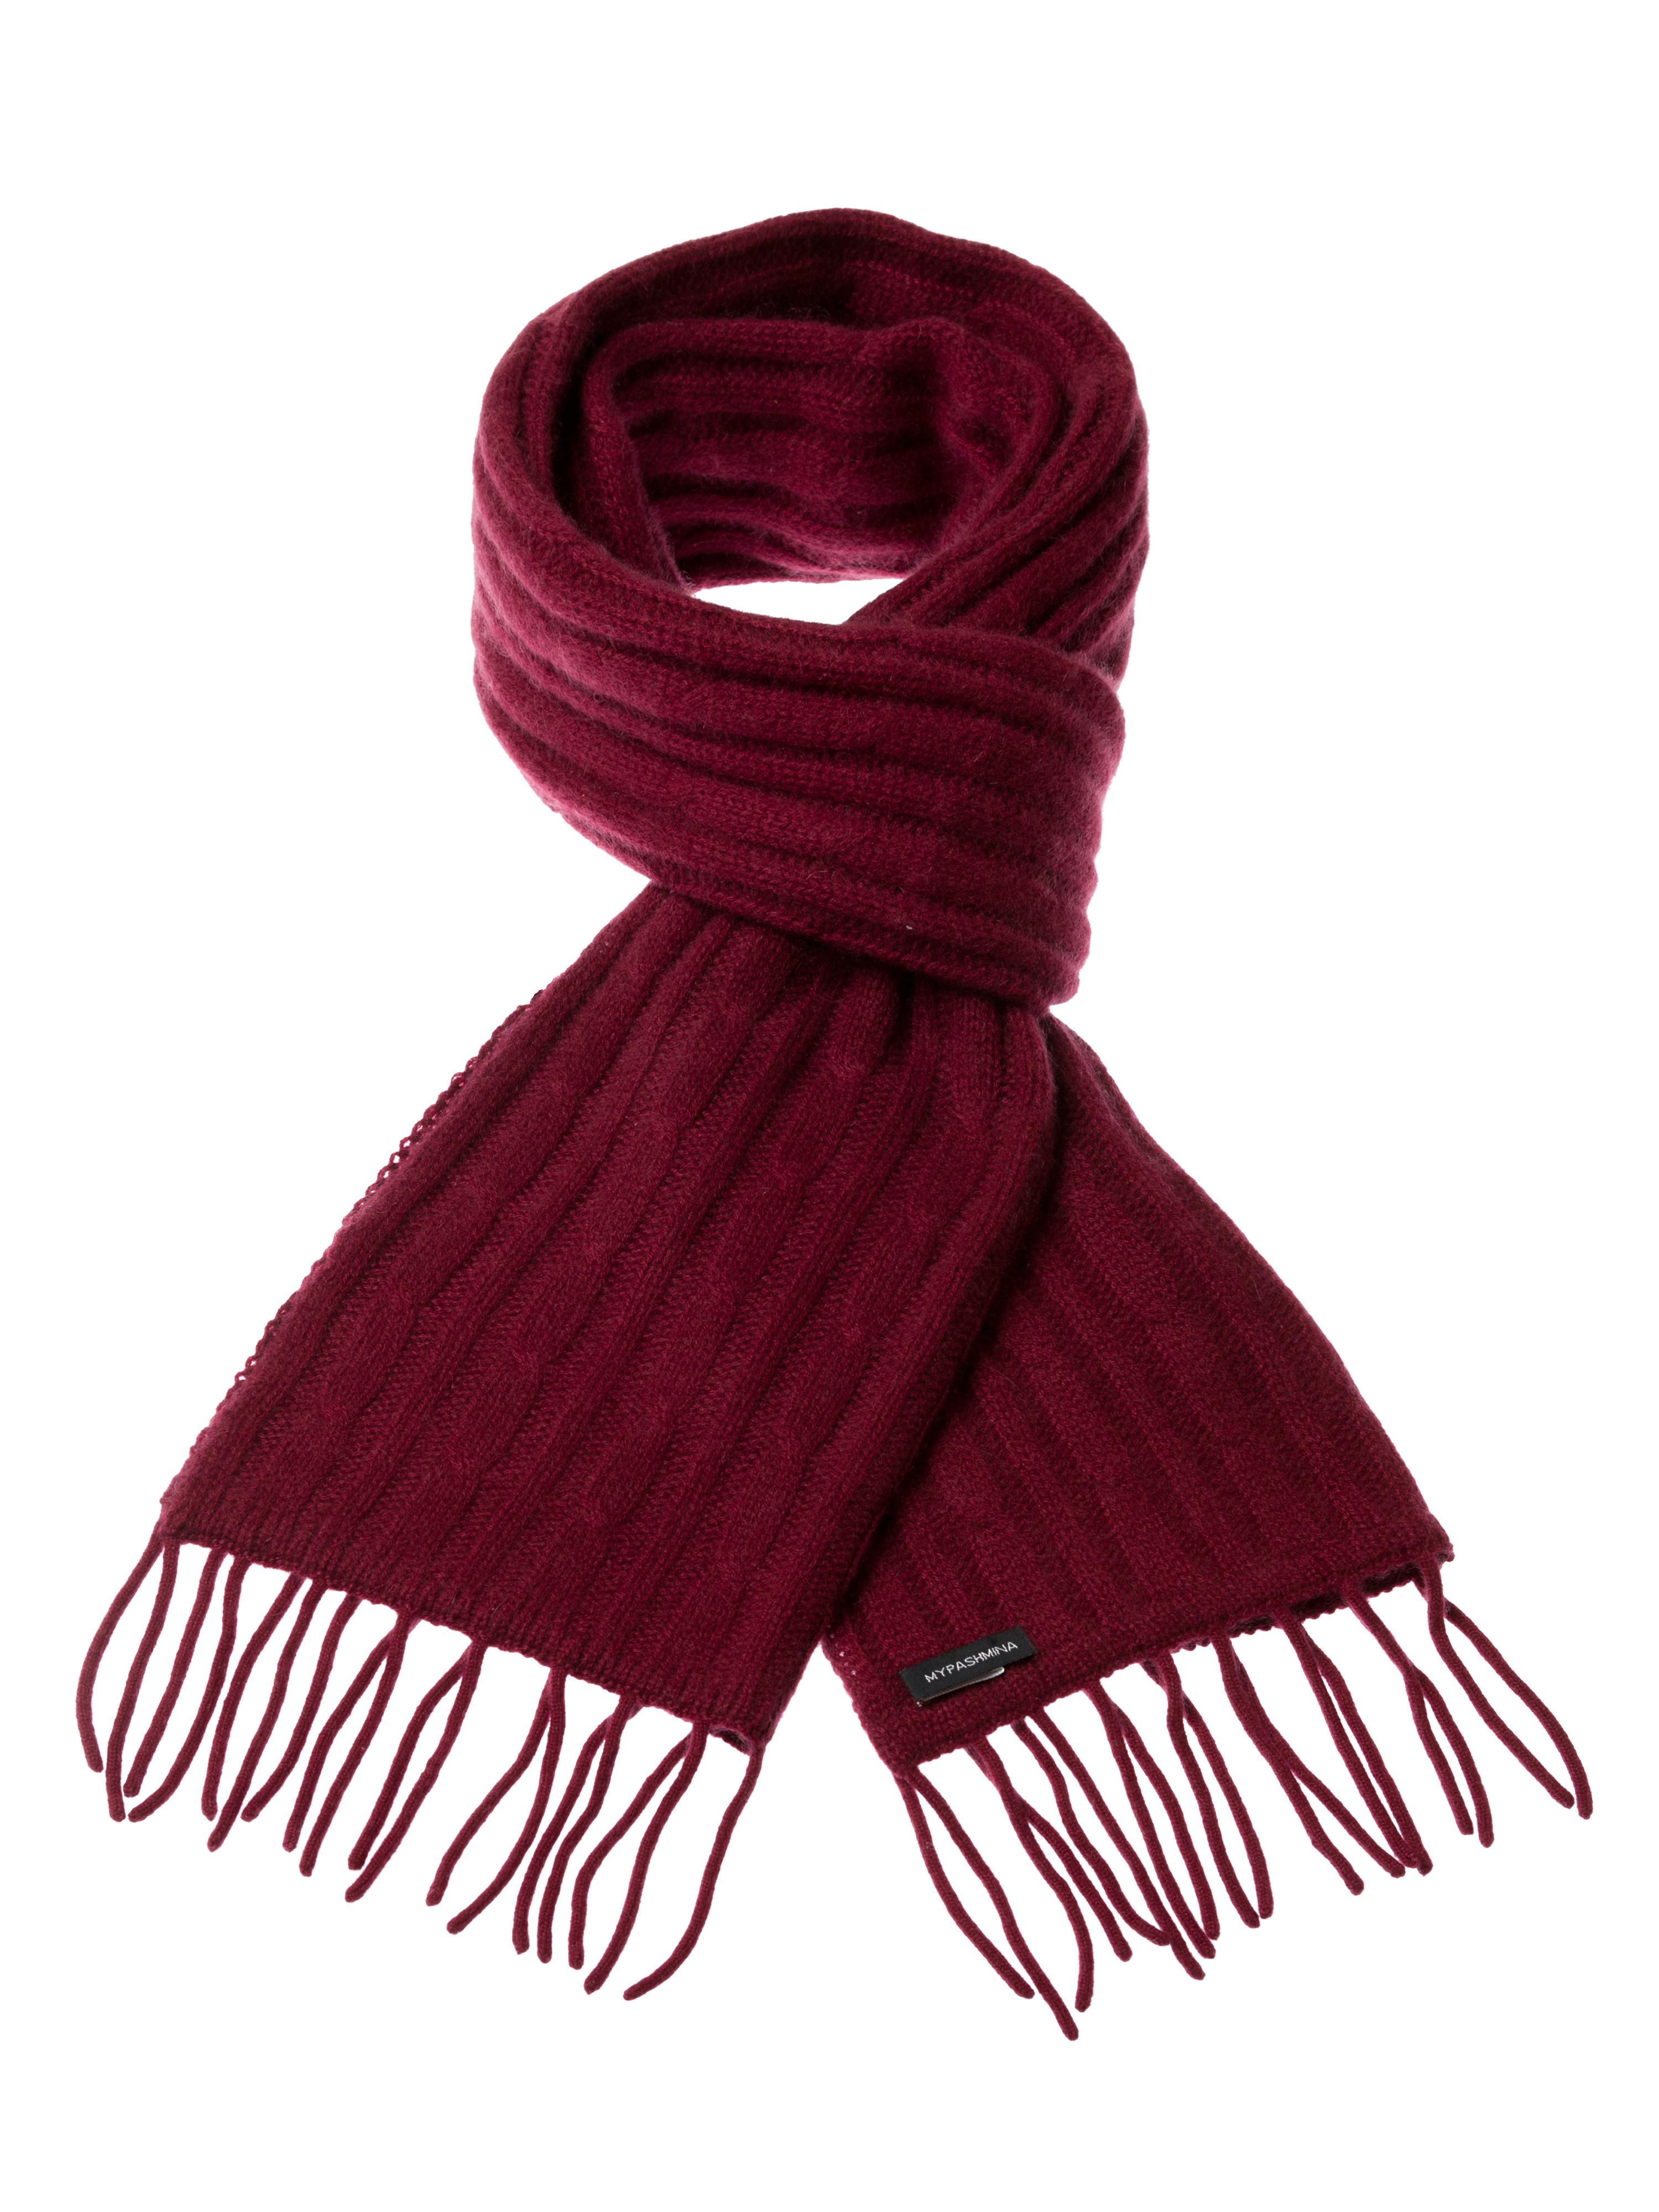 aa872bdc78d Cable Knit Scarf – 100% Cashmere – 35x180cm – Burgundy – Mypashmina